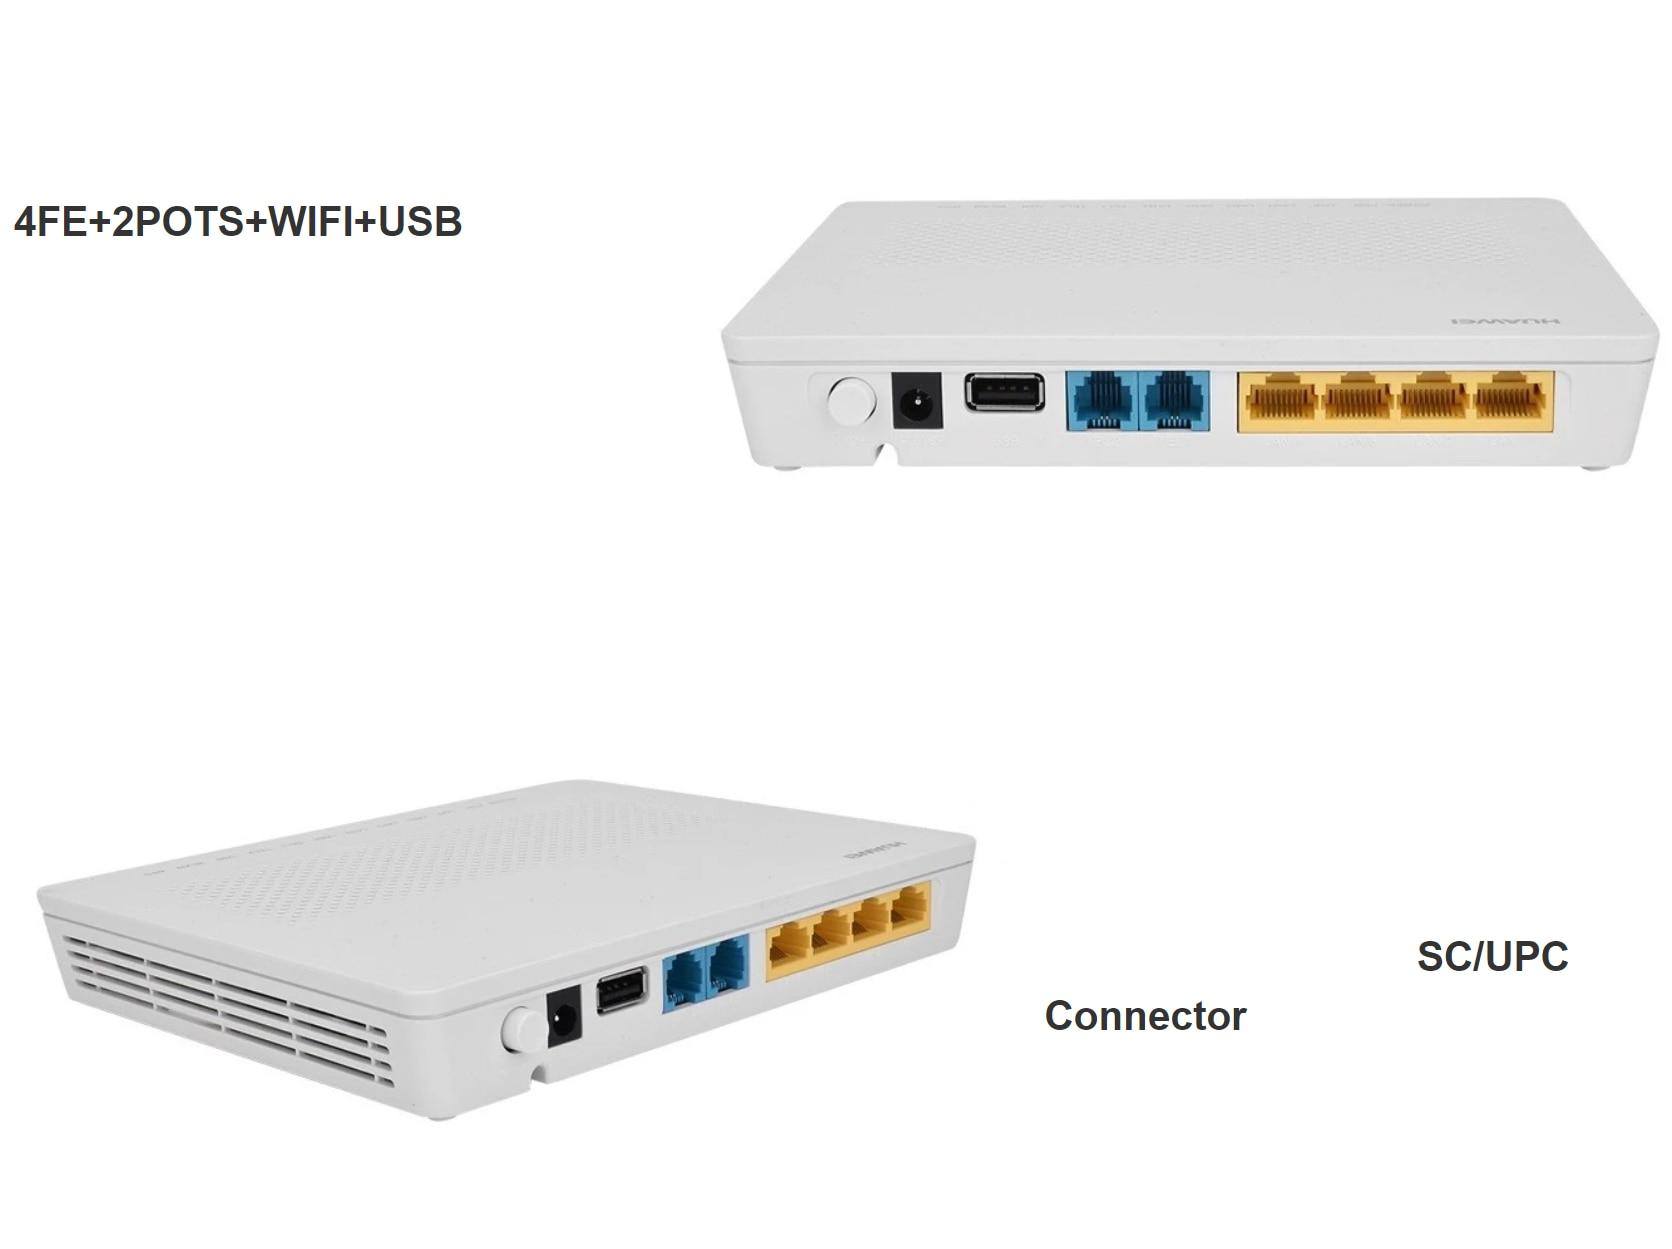 5pcs 10/pcs Lot HG8346M 8245A 4FE +2POTS +WiFi EPON GPON XPON Refurbished Huawei ONU FTTH Eng OS Mordem Router Fire to the home